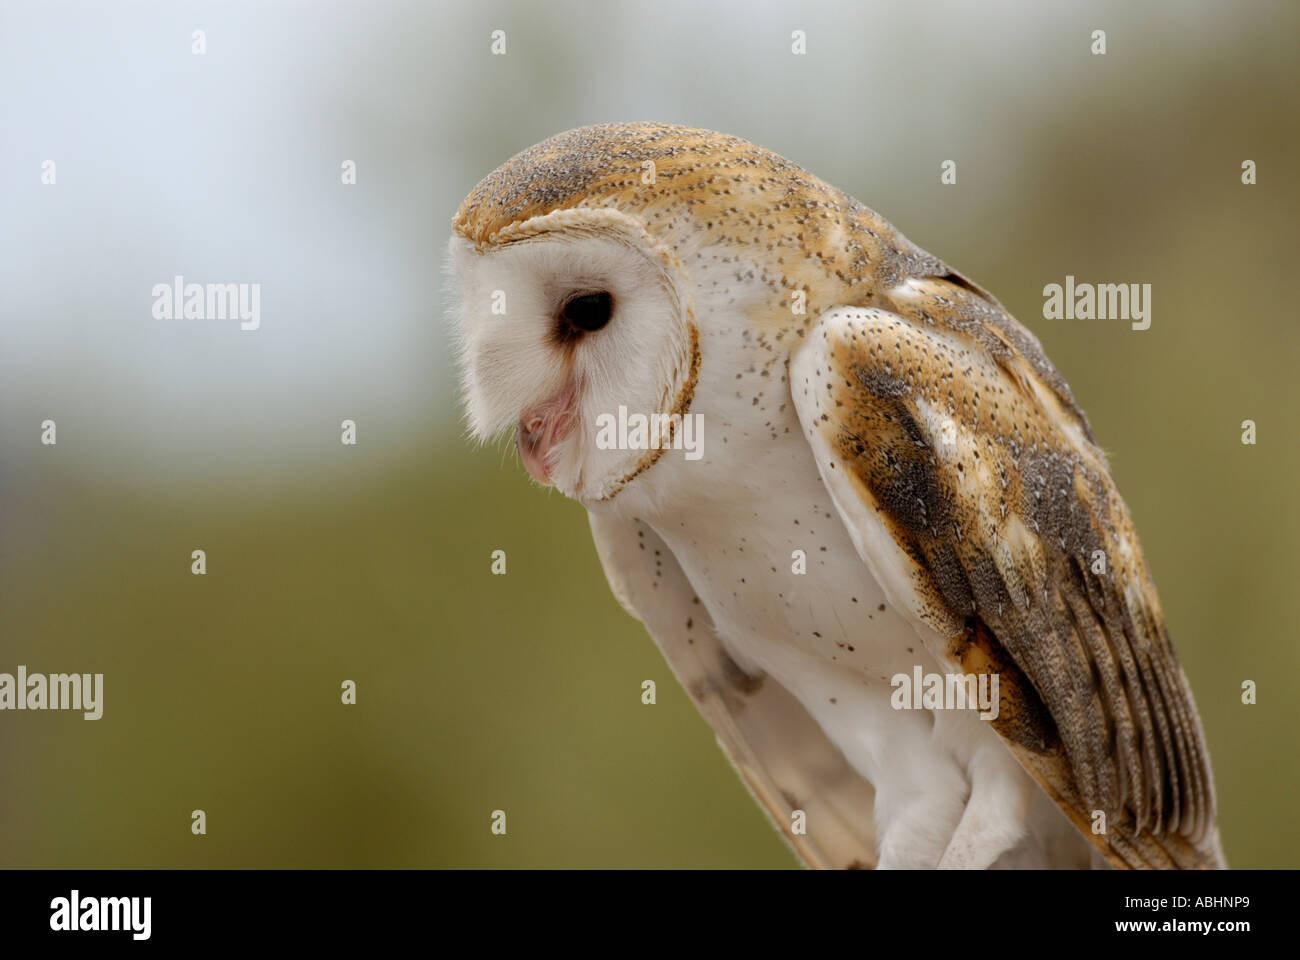 Barn owl, Tyto alba, body and head looking down - Stock Image